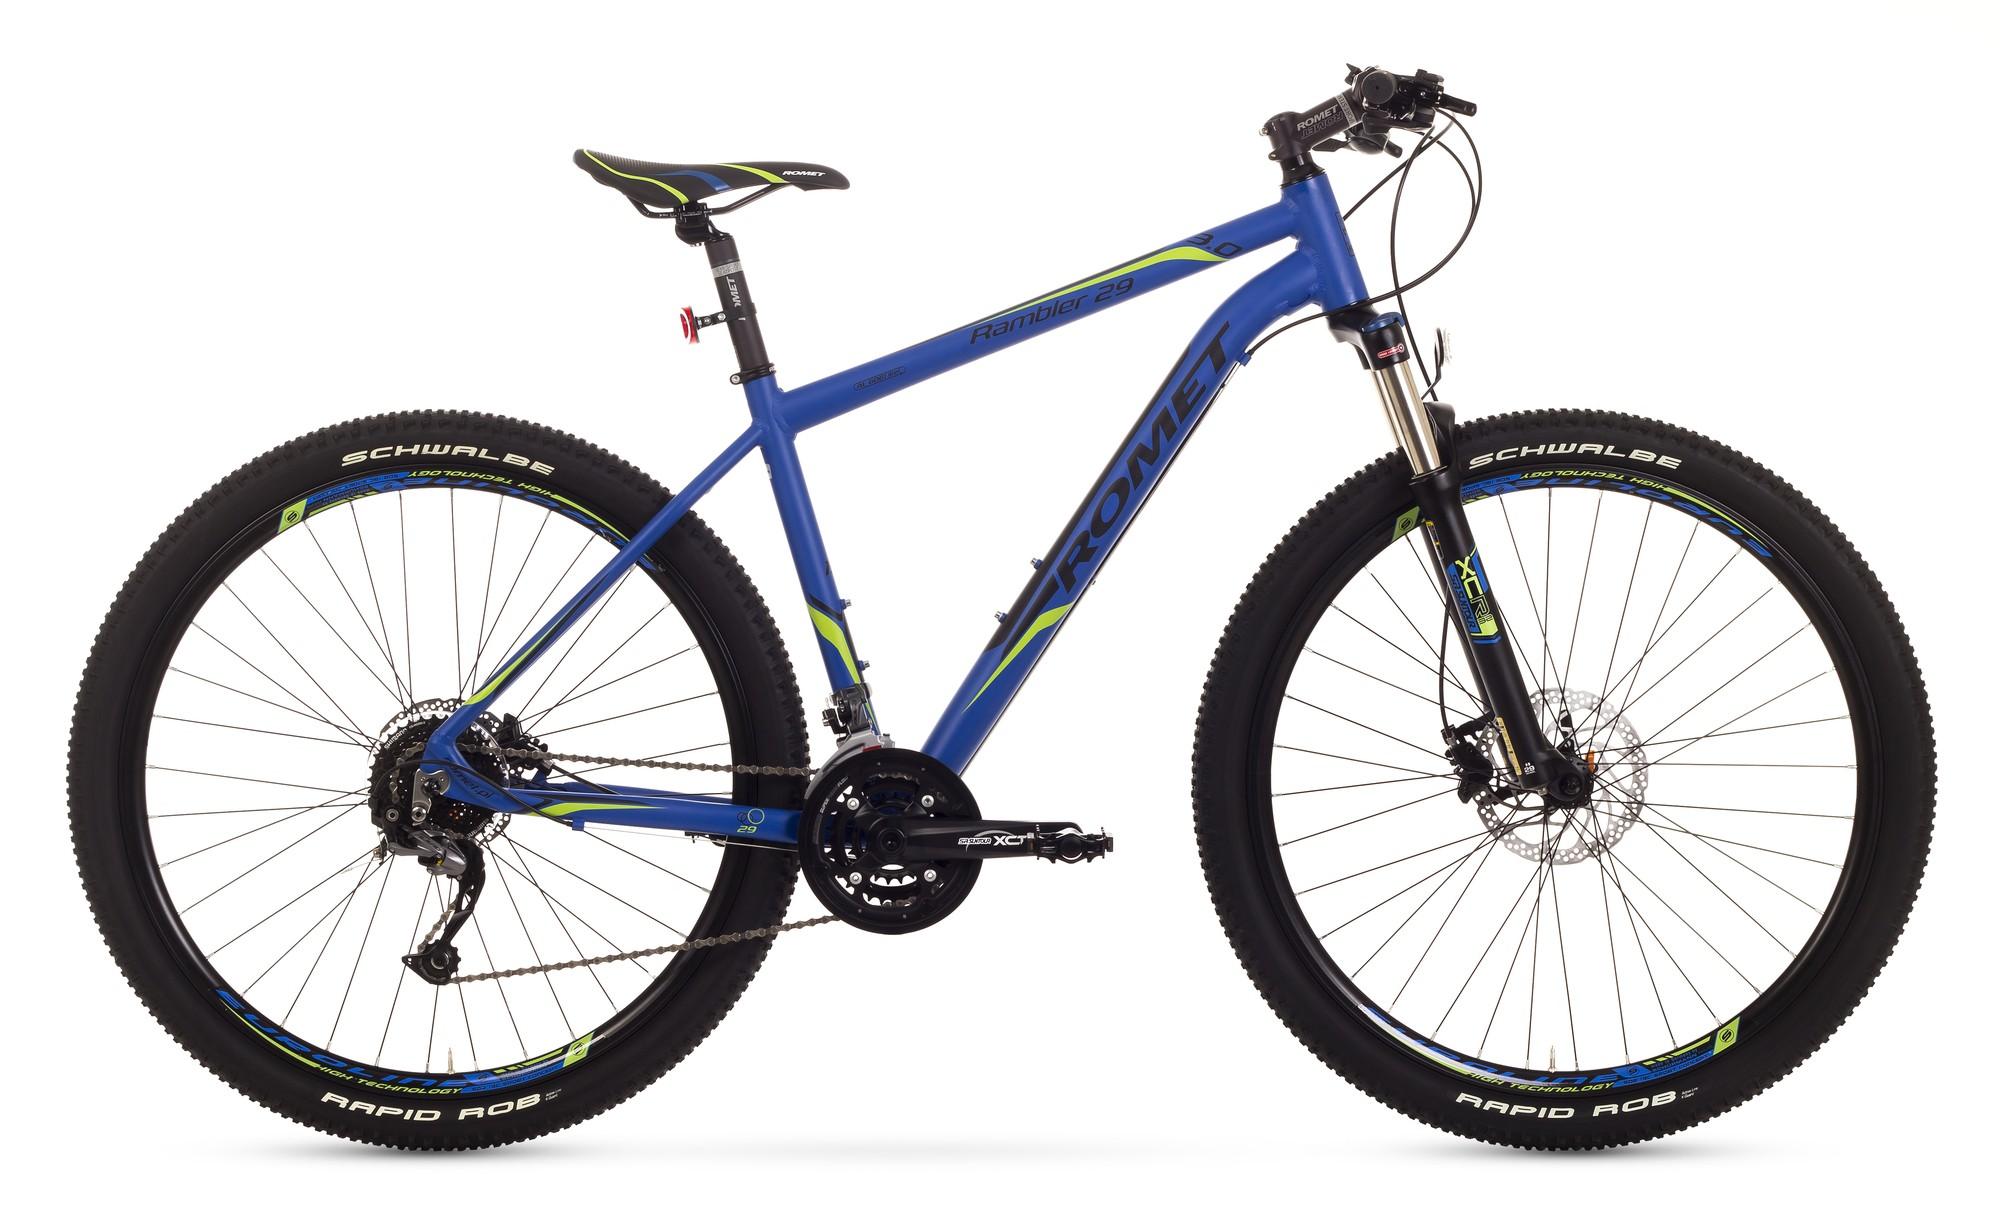 Bicicleta MTB Romet Rambler 29 3.0 - albastru-galben